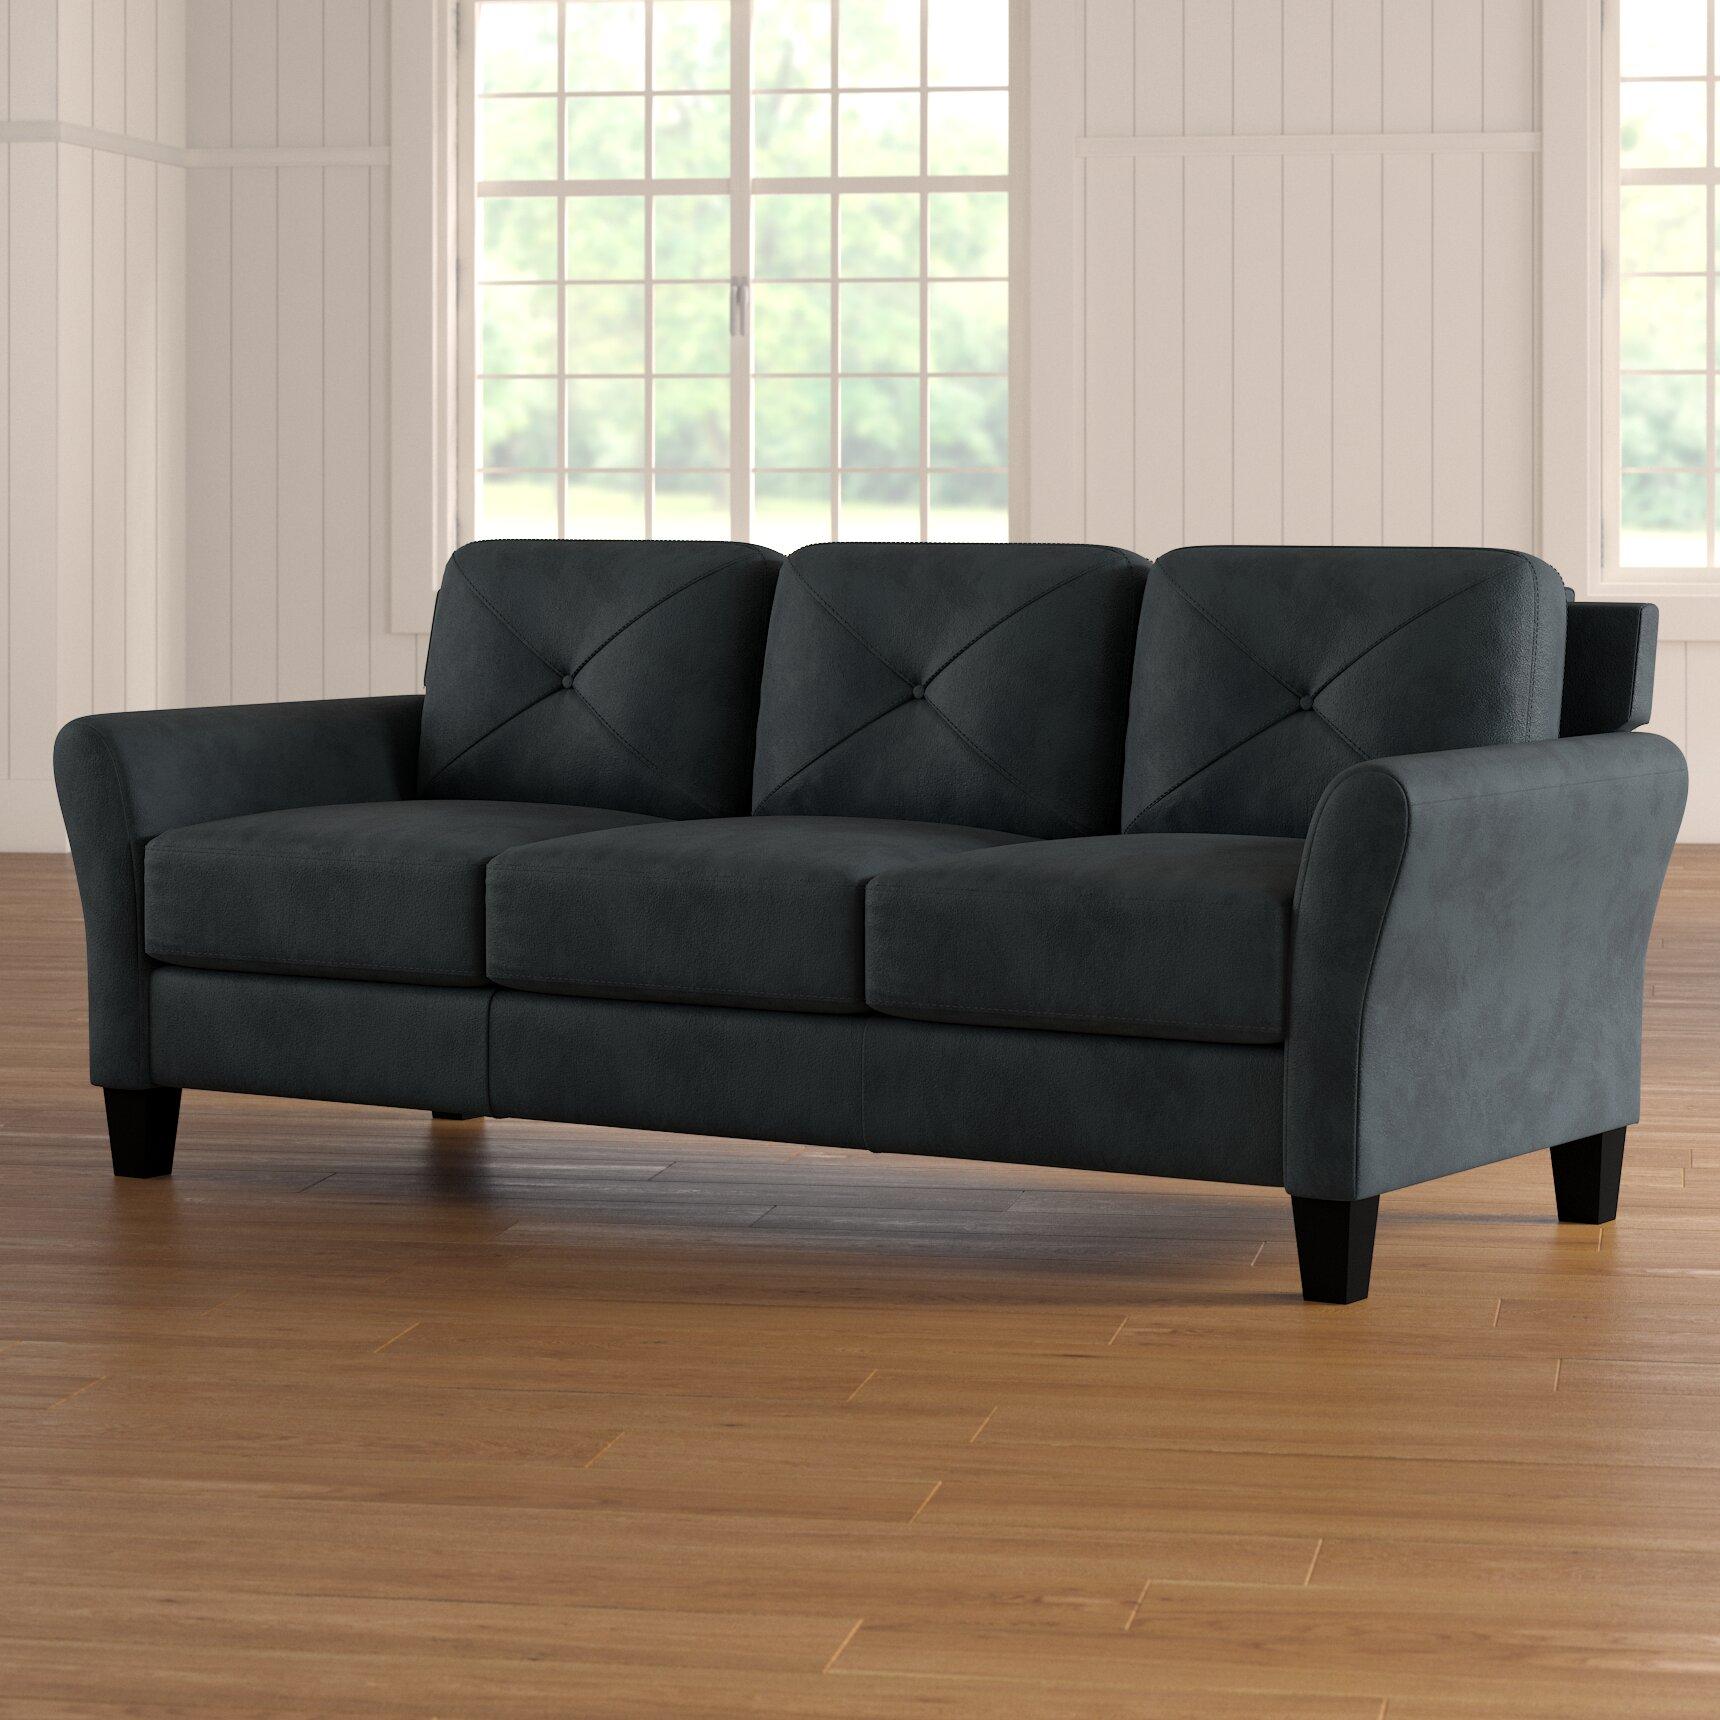 Brilliant Liston Standard Sofa Machost Co Dining Chair Design Ideas Machostcouk